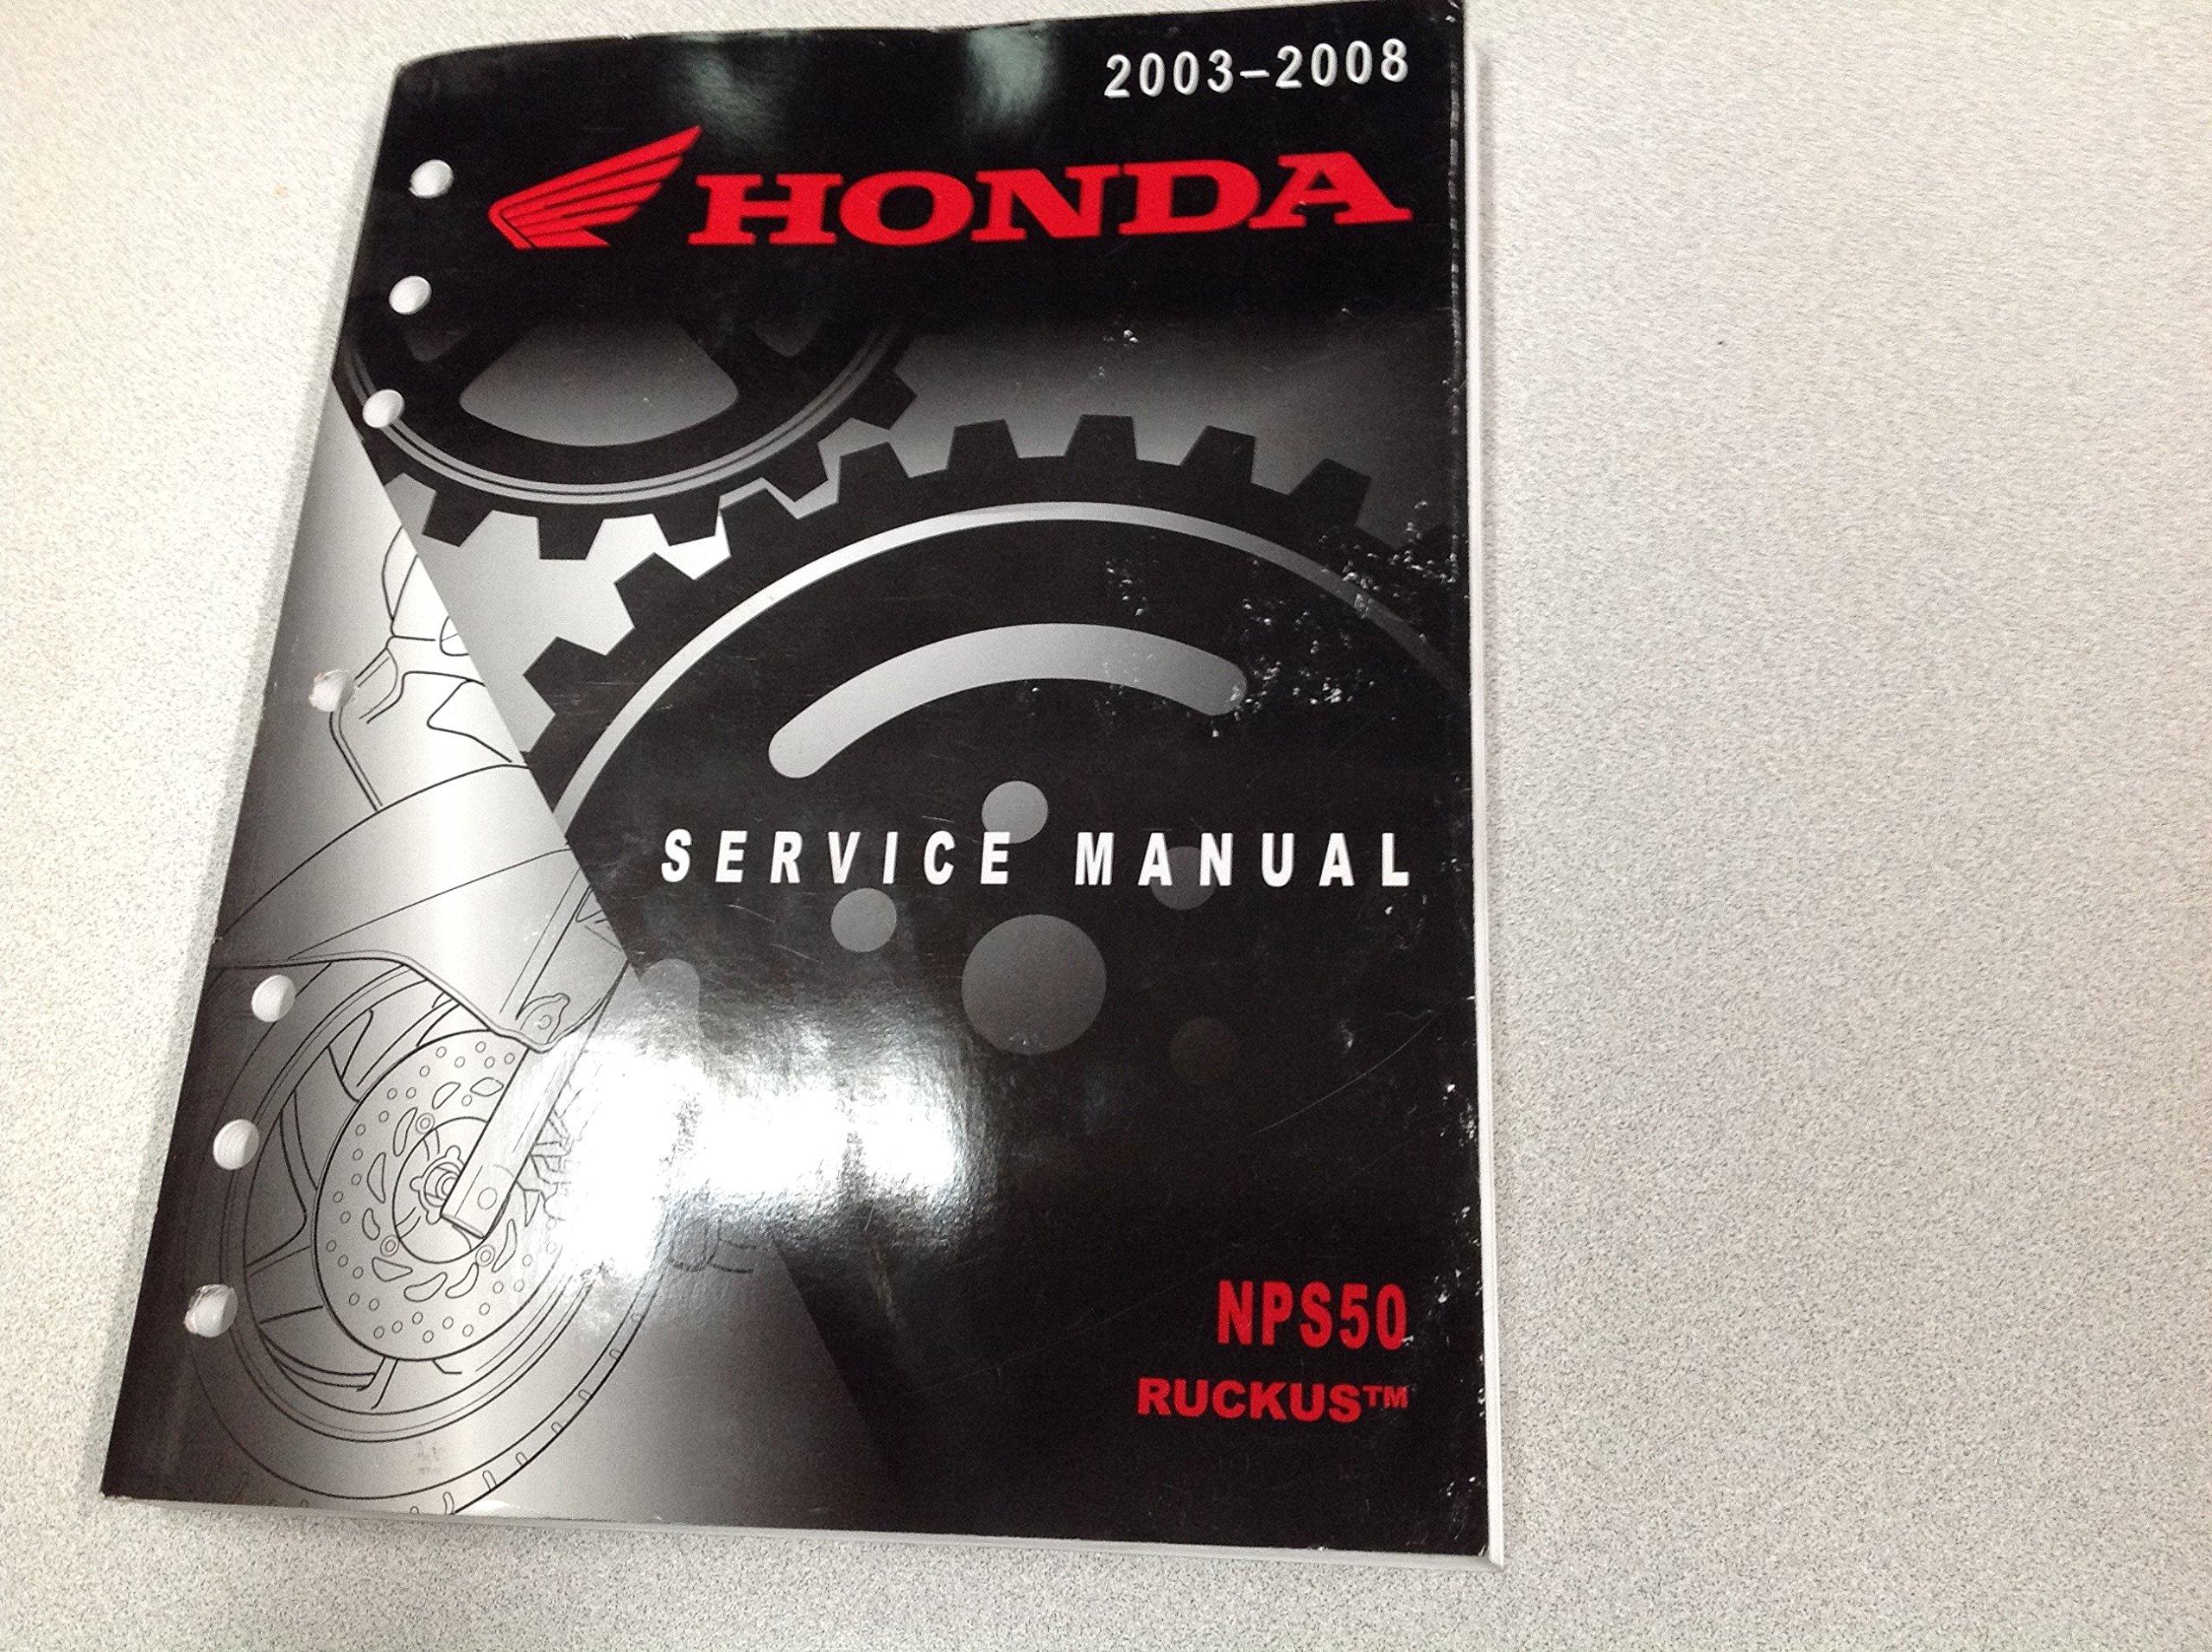 2003 2004 2005 2006 2007 2008 Honda NPS50 RUCKUS Service Shop Repair Manual:  HONDA, HONDA SCOOTER: Amazon.com: Books